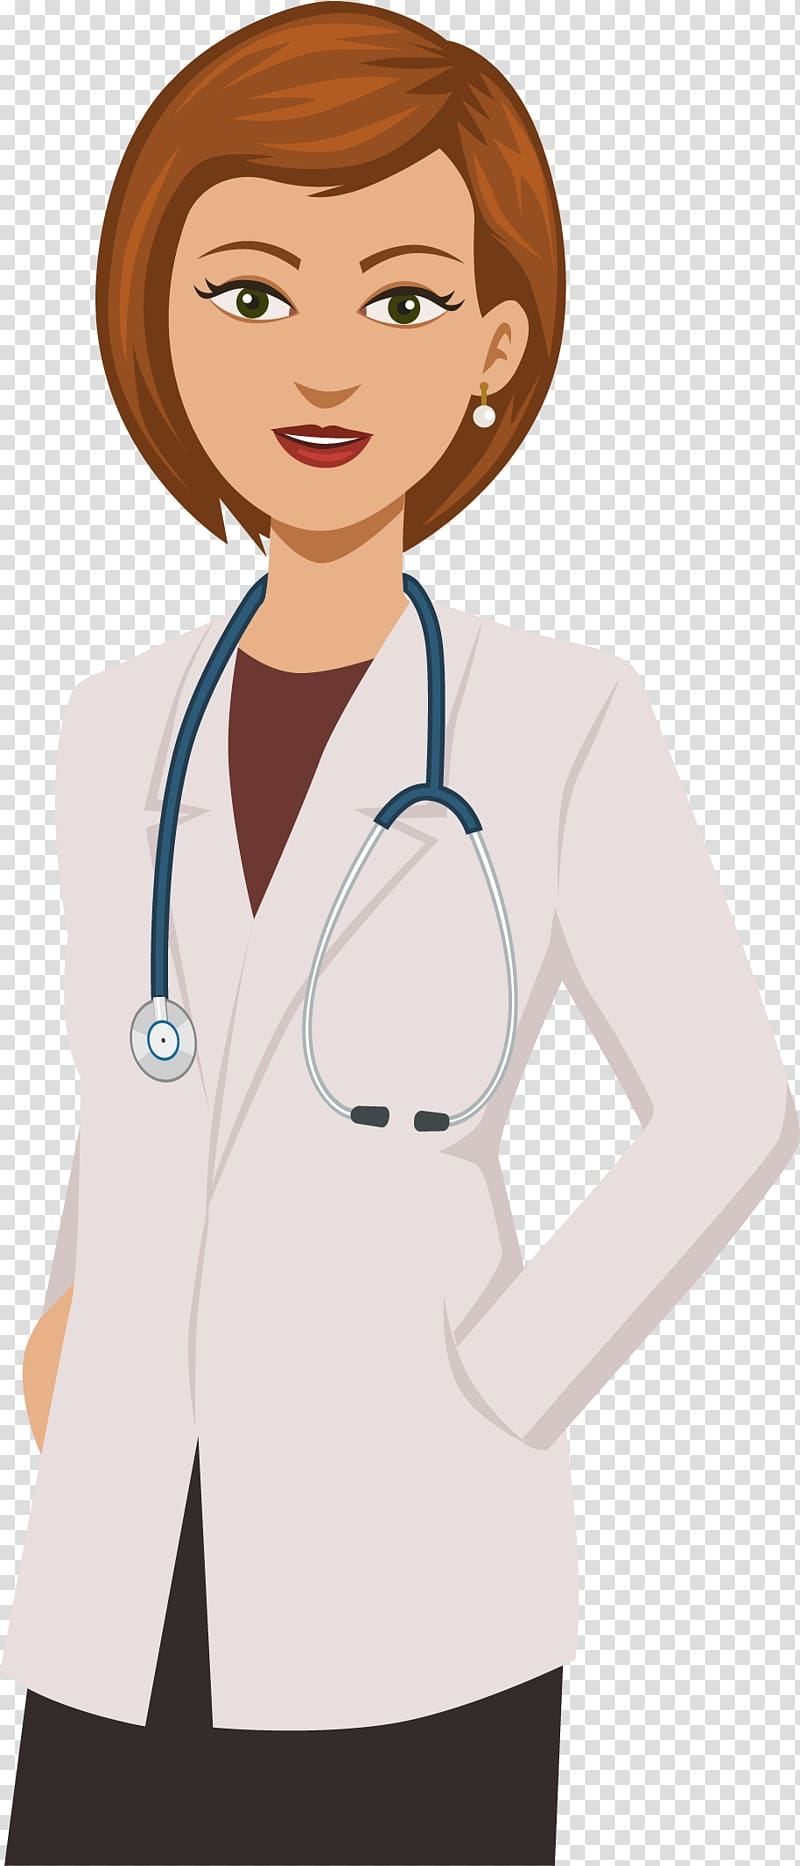 ilustrasi dokter wanita, Cartoon Network Physician Adventure Time, Cartoon female doctor png